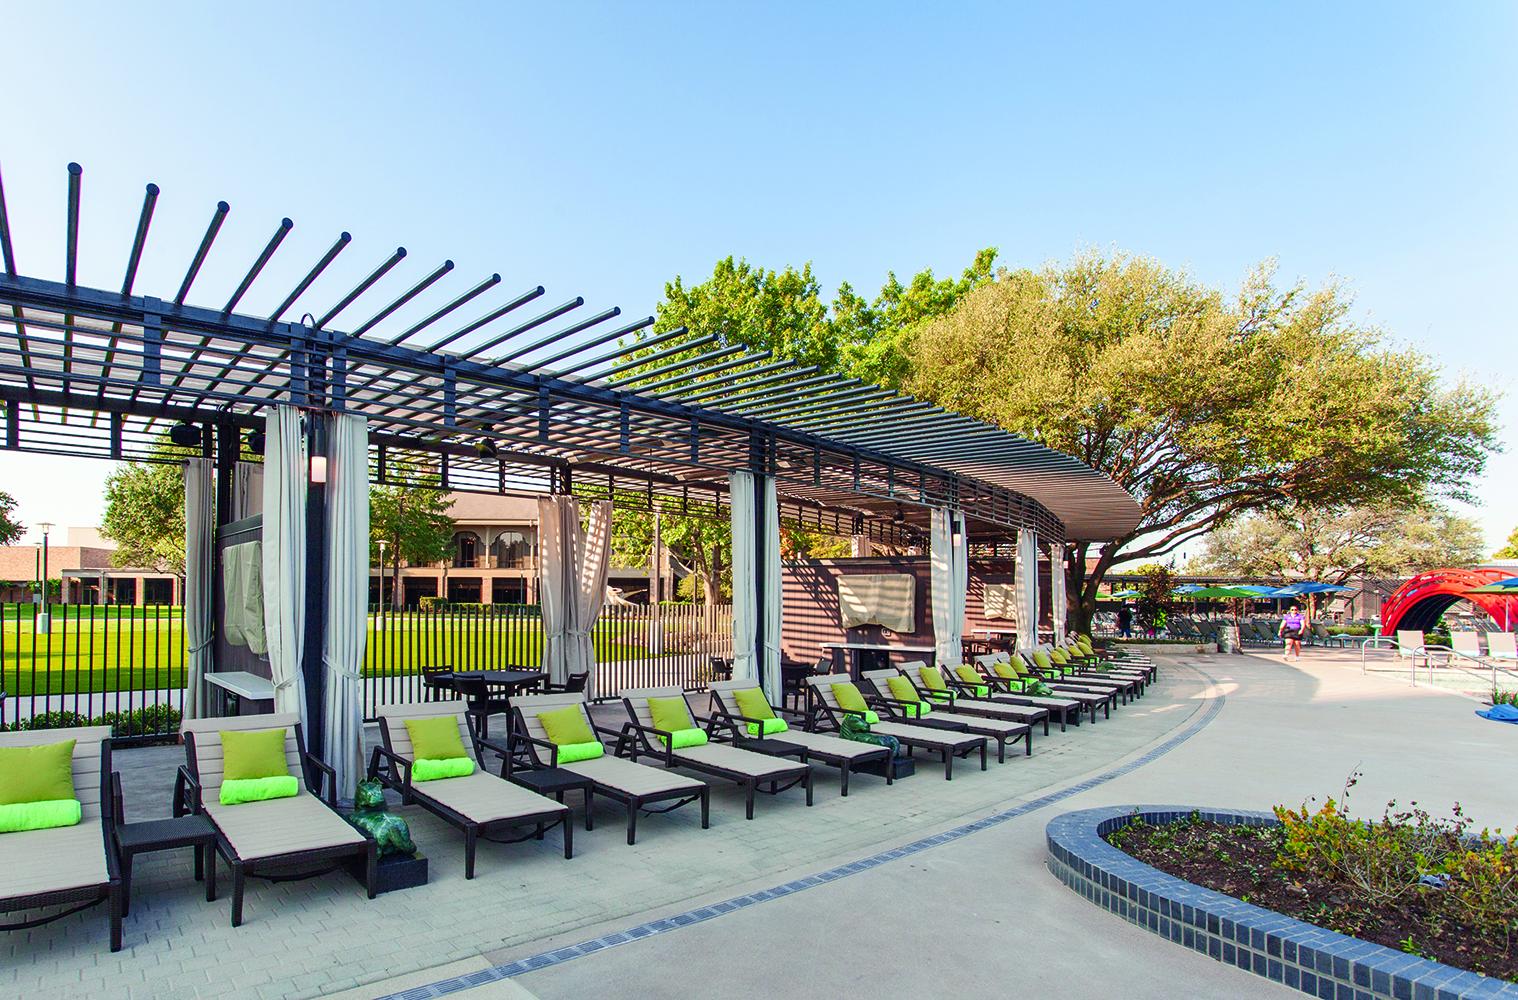 Scope modern lighting fixtures illuminate a poolside pergola structure.